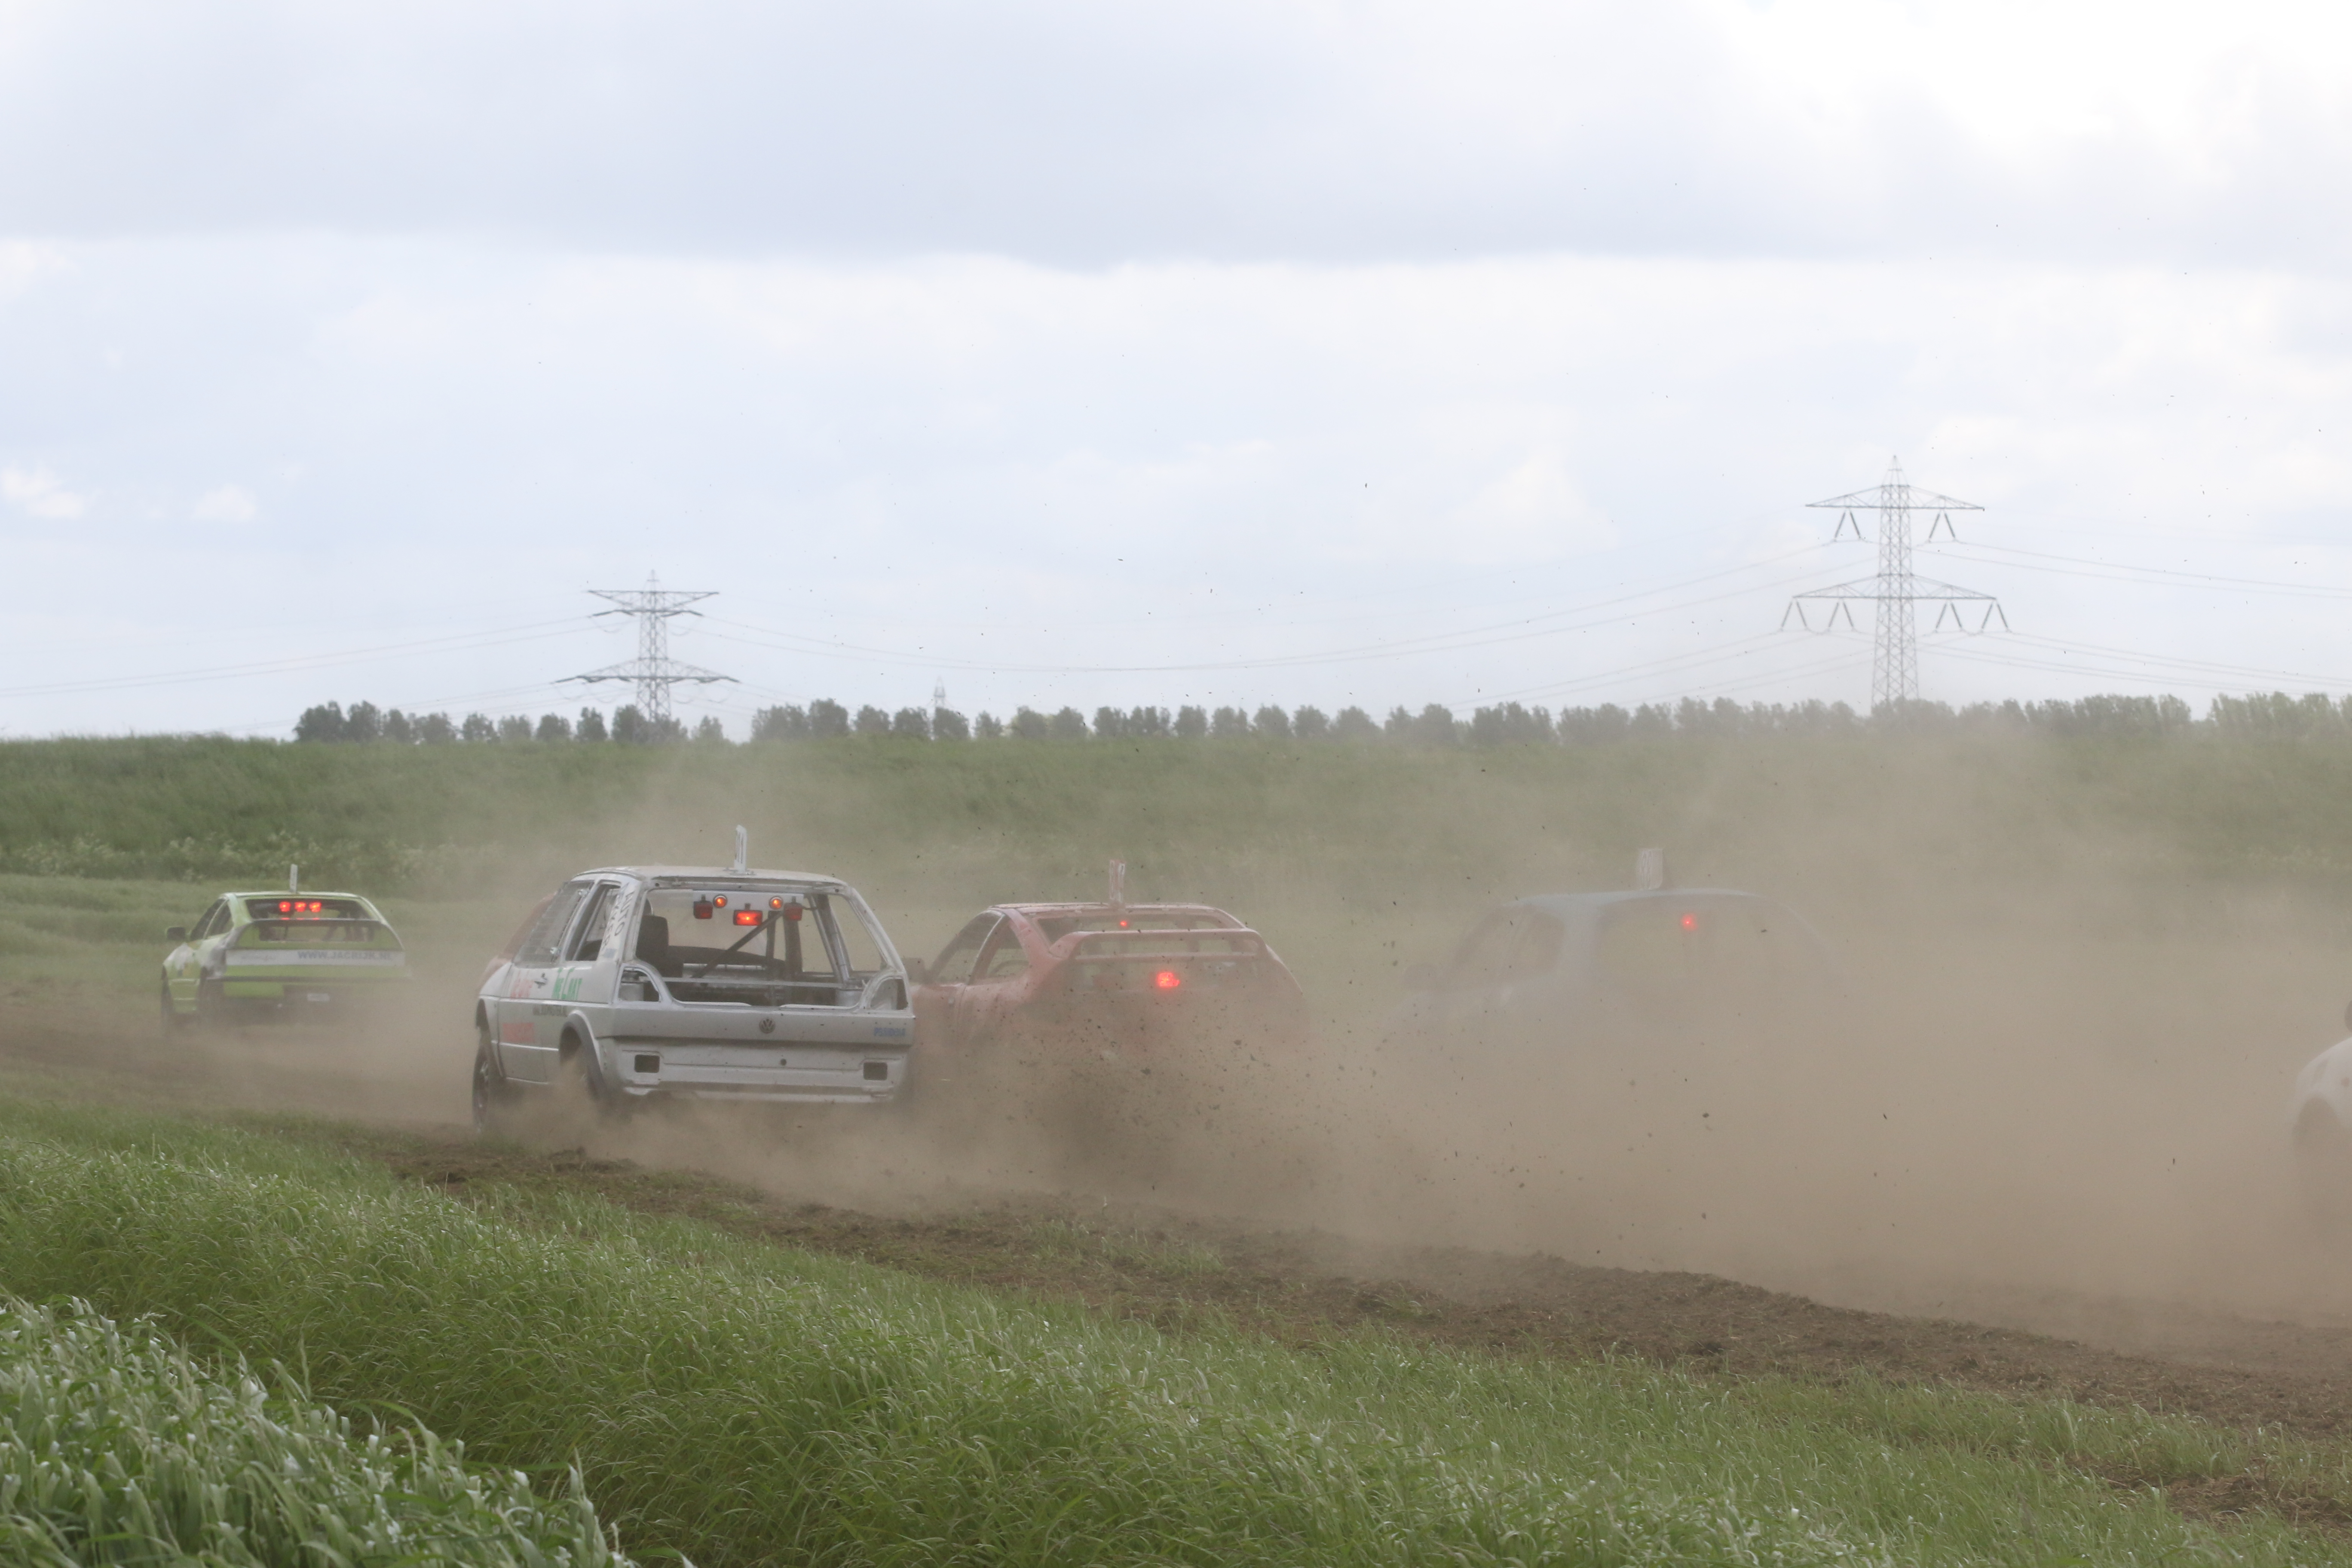 autocross sluiskil 14-5-2016 064